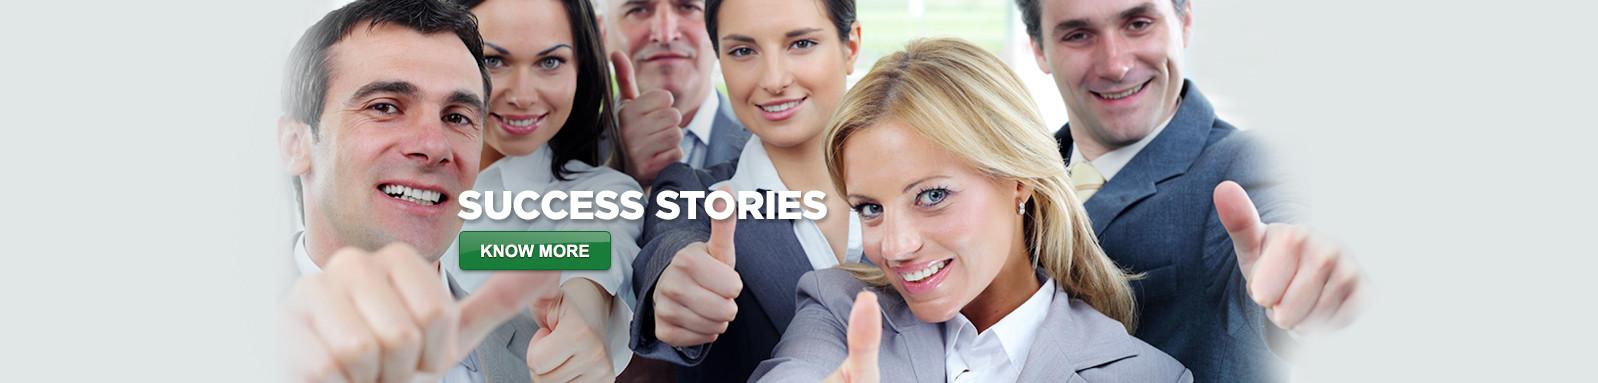 Read Stepathlon's success stories